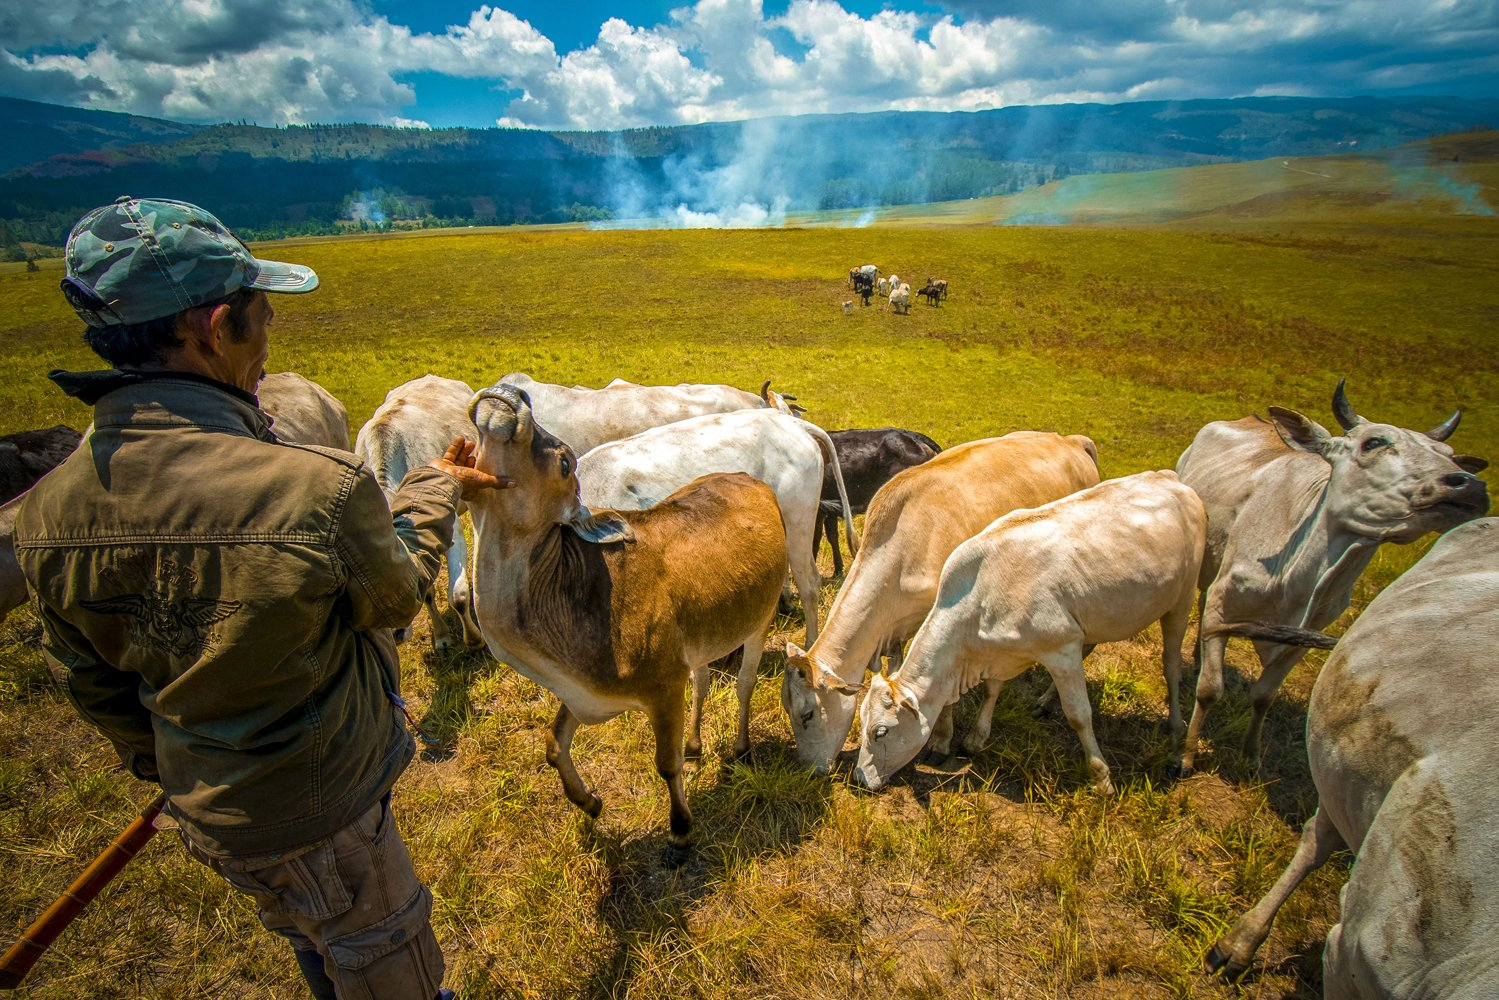 Seorang penggembala mendekati hewan ternaknya di peternakan leluhur di Desa Winowanga, Lore Timur, Poso, Sulawesi Tengah. Meski dilepasliarkan, namun setiap penggembala dapat mendekati ternak itu dengan meneriakkan kata \